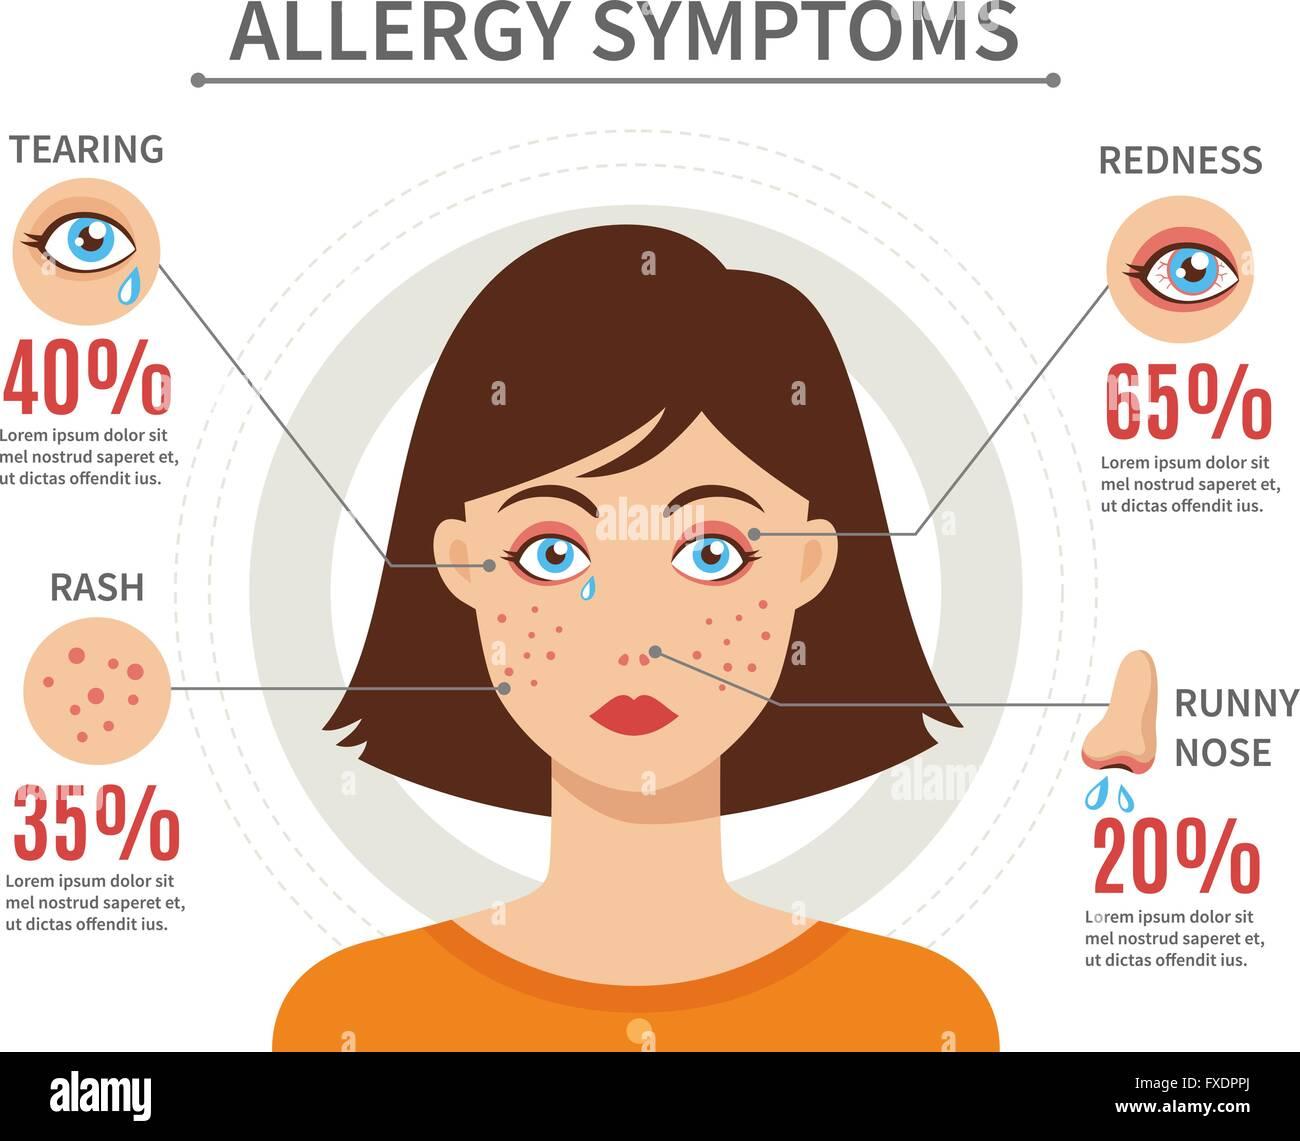 Allergy Symptoms Flat Style Concept Stock Vector Art